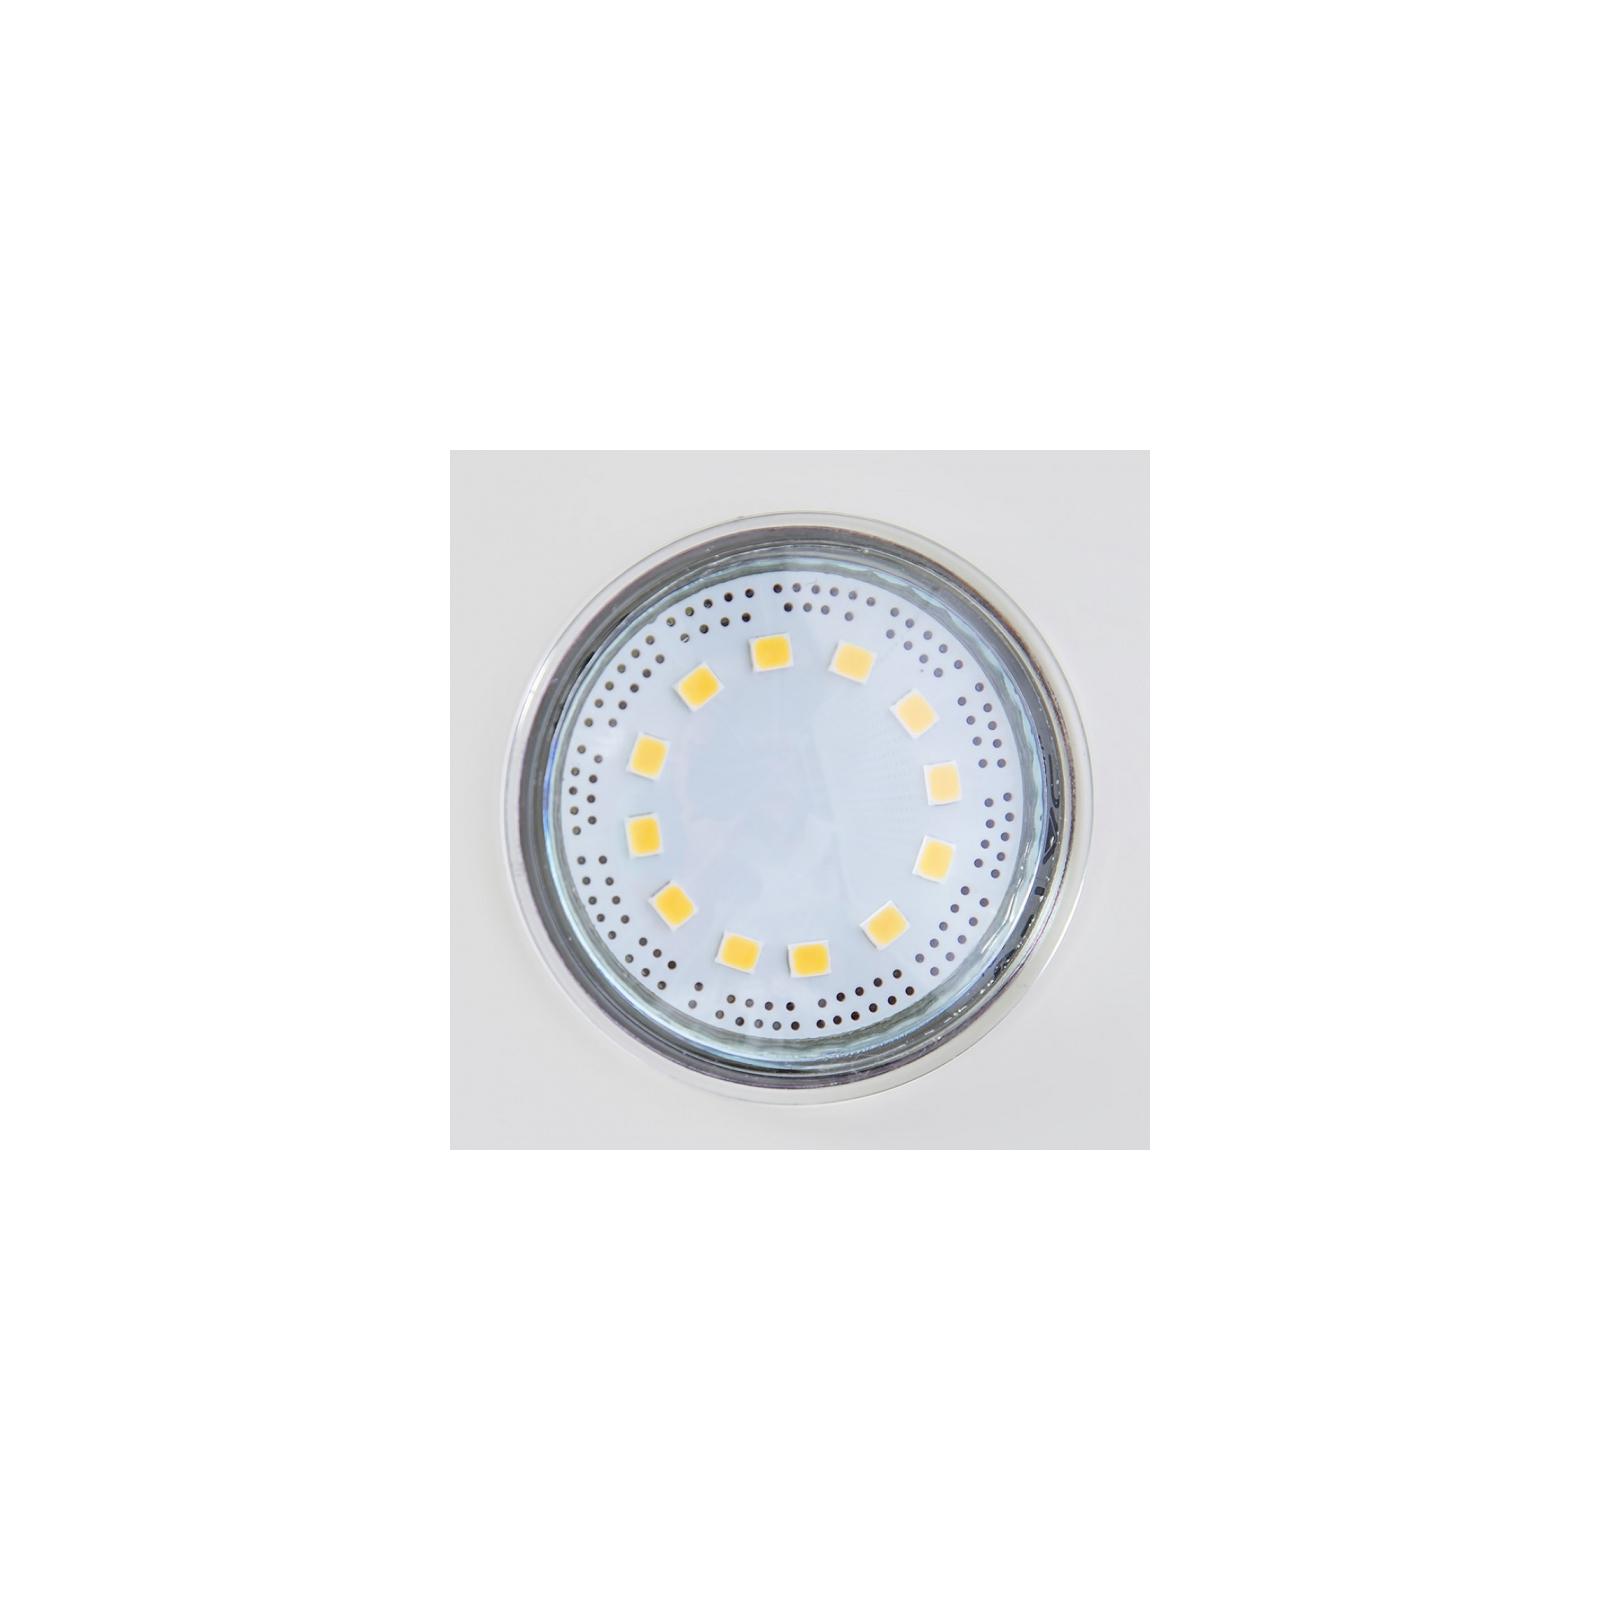 Вытяжка кухонная PERFELLI TL 6612 BL LED изображение 3